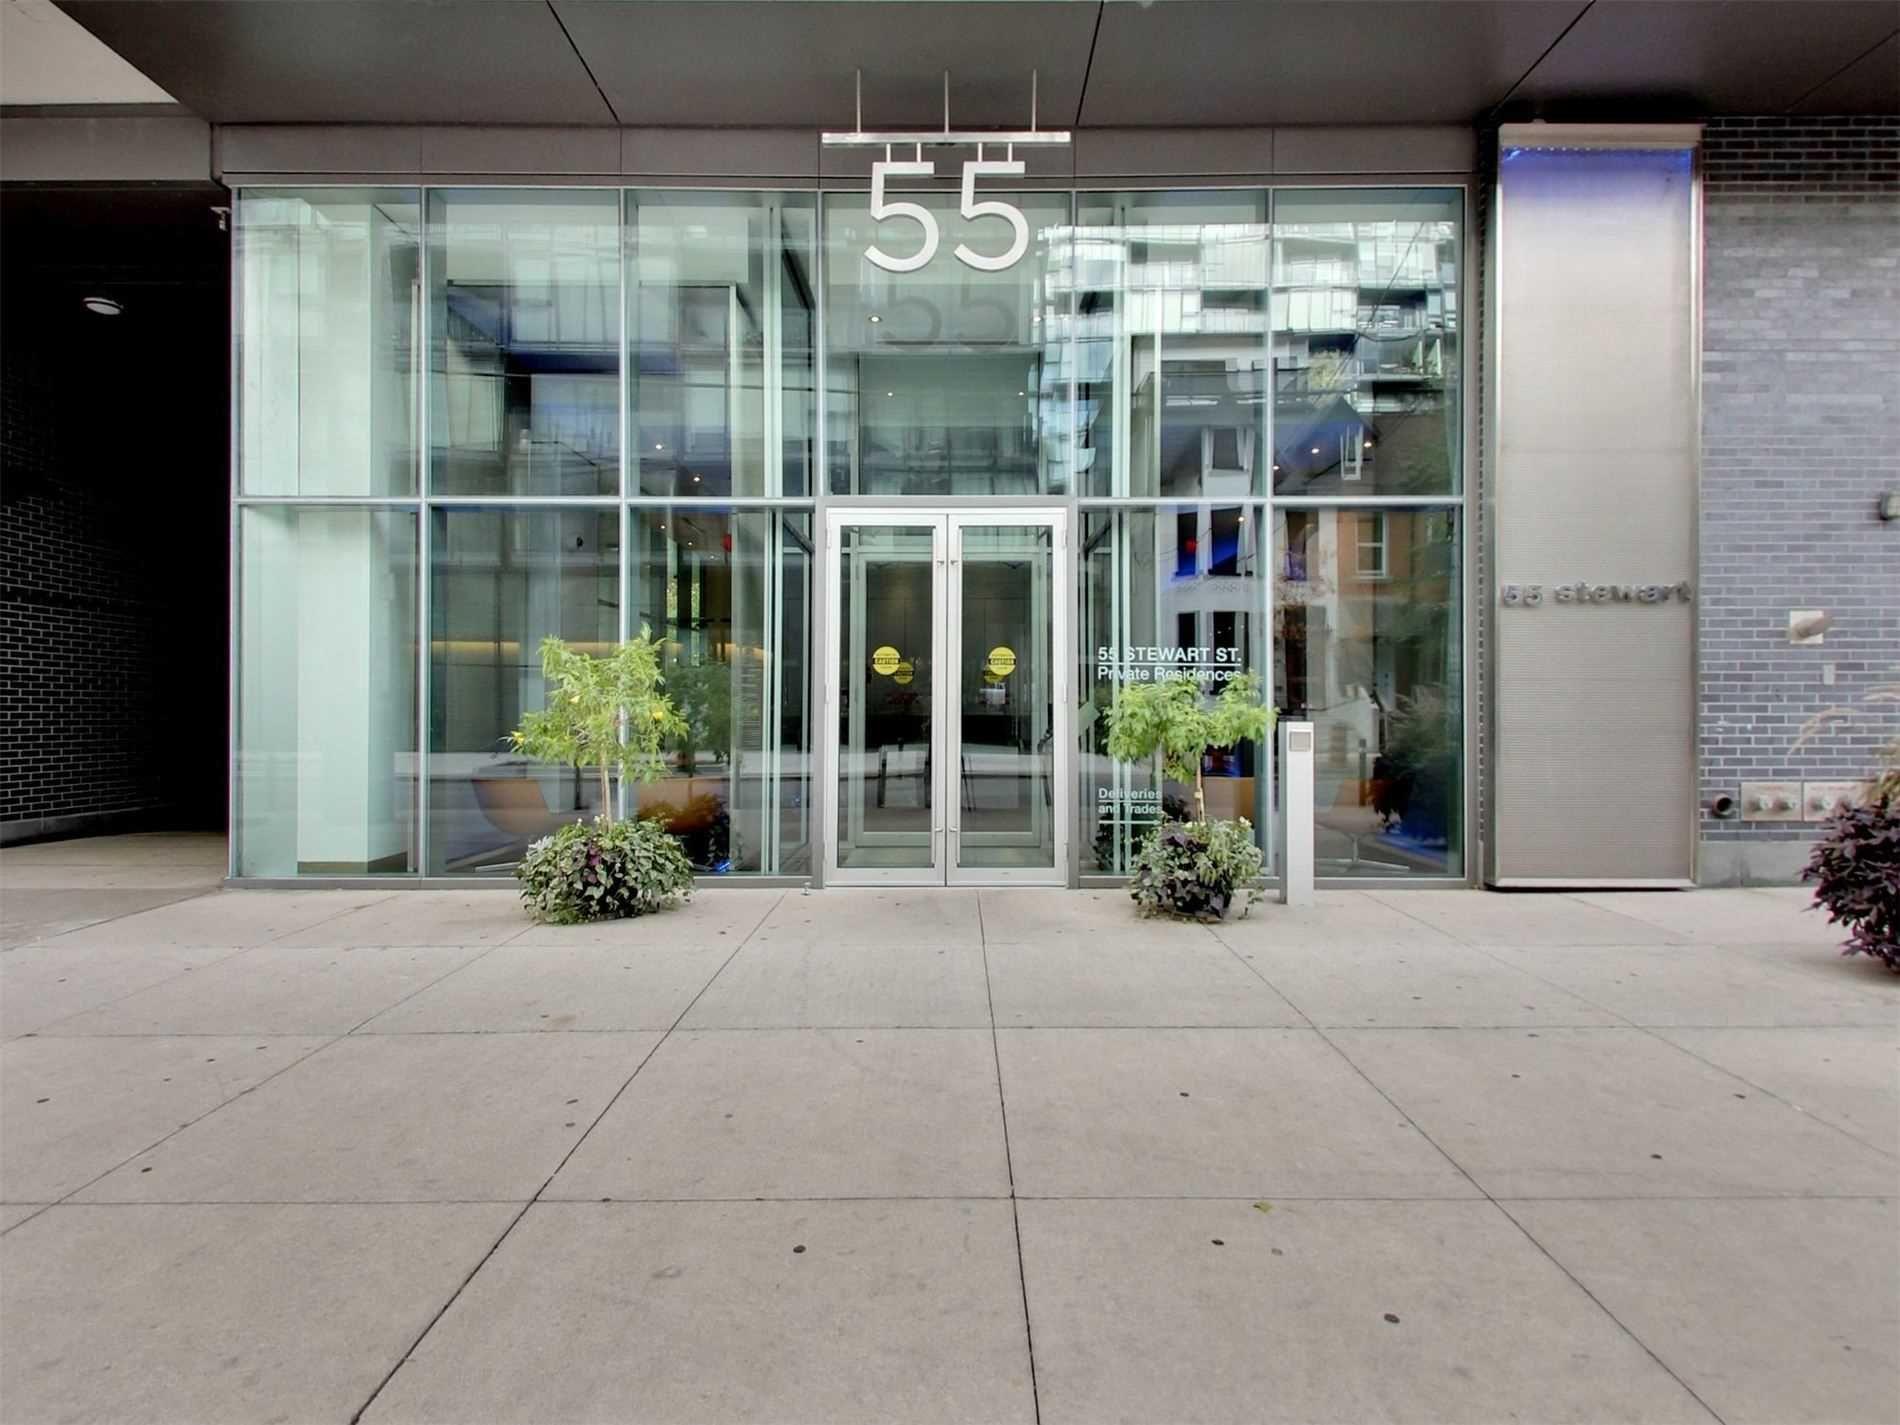 Main Photo: 818 55 Stewart Street in Toronto: Waterfront Communities C1 Condo for sale (Toronto C01)  : MLS®# C4690098